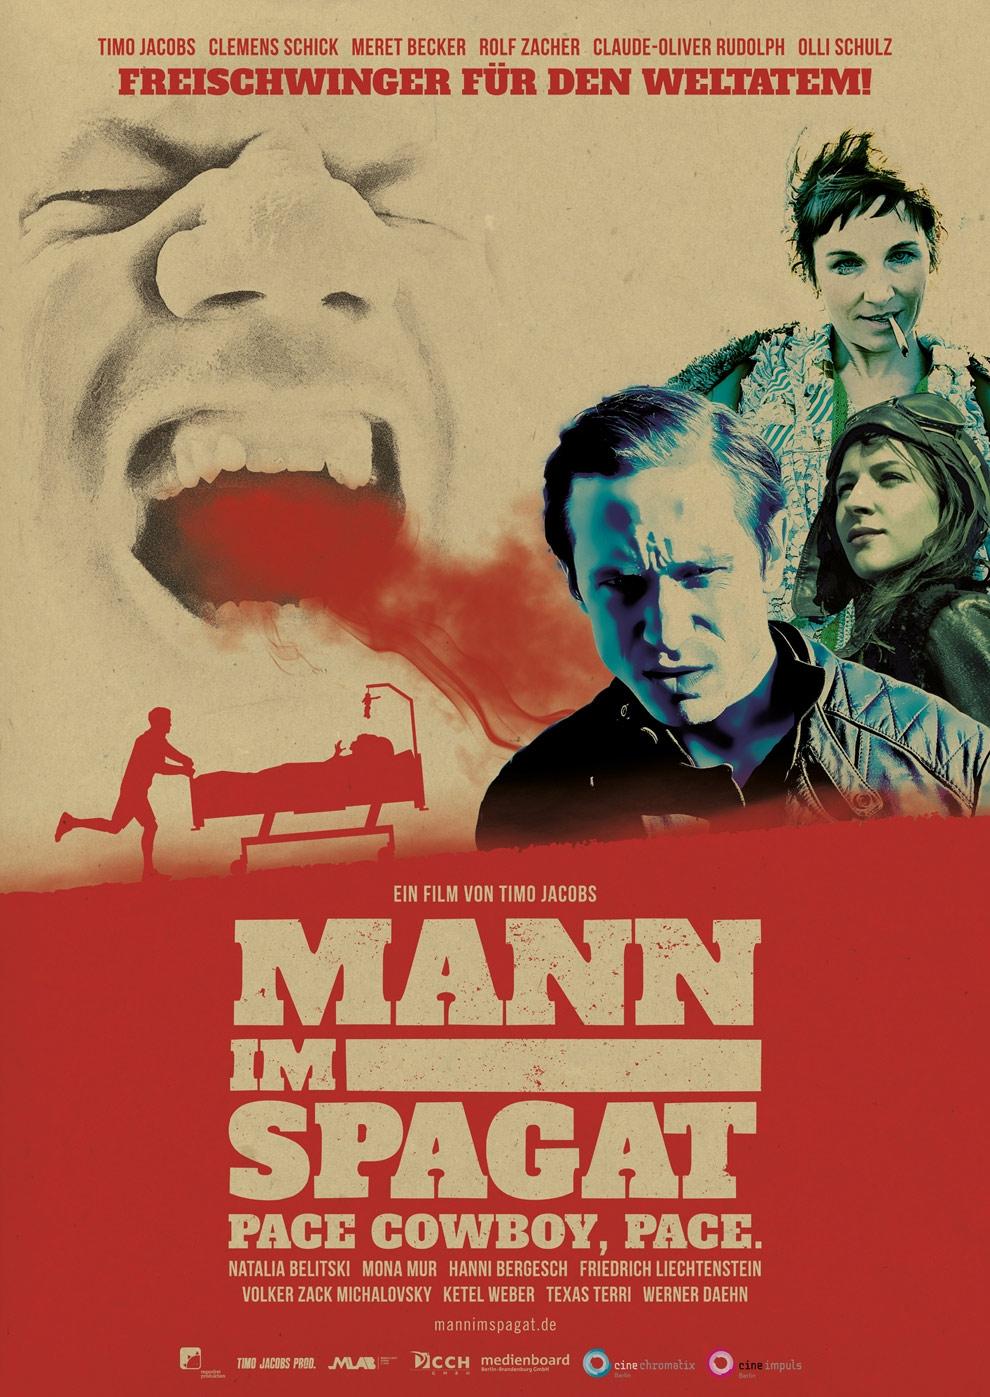 Mann im Spagat: Pace, Cowboy, Pace (Poster)